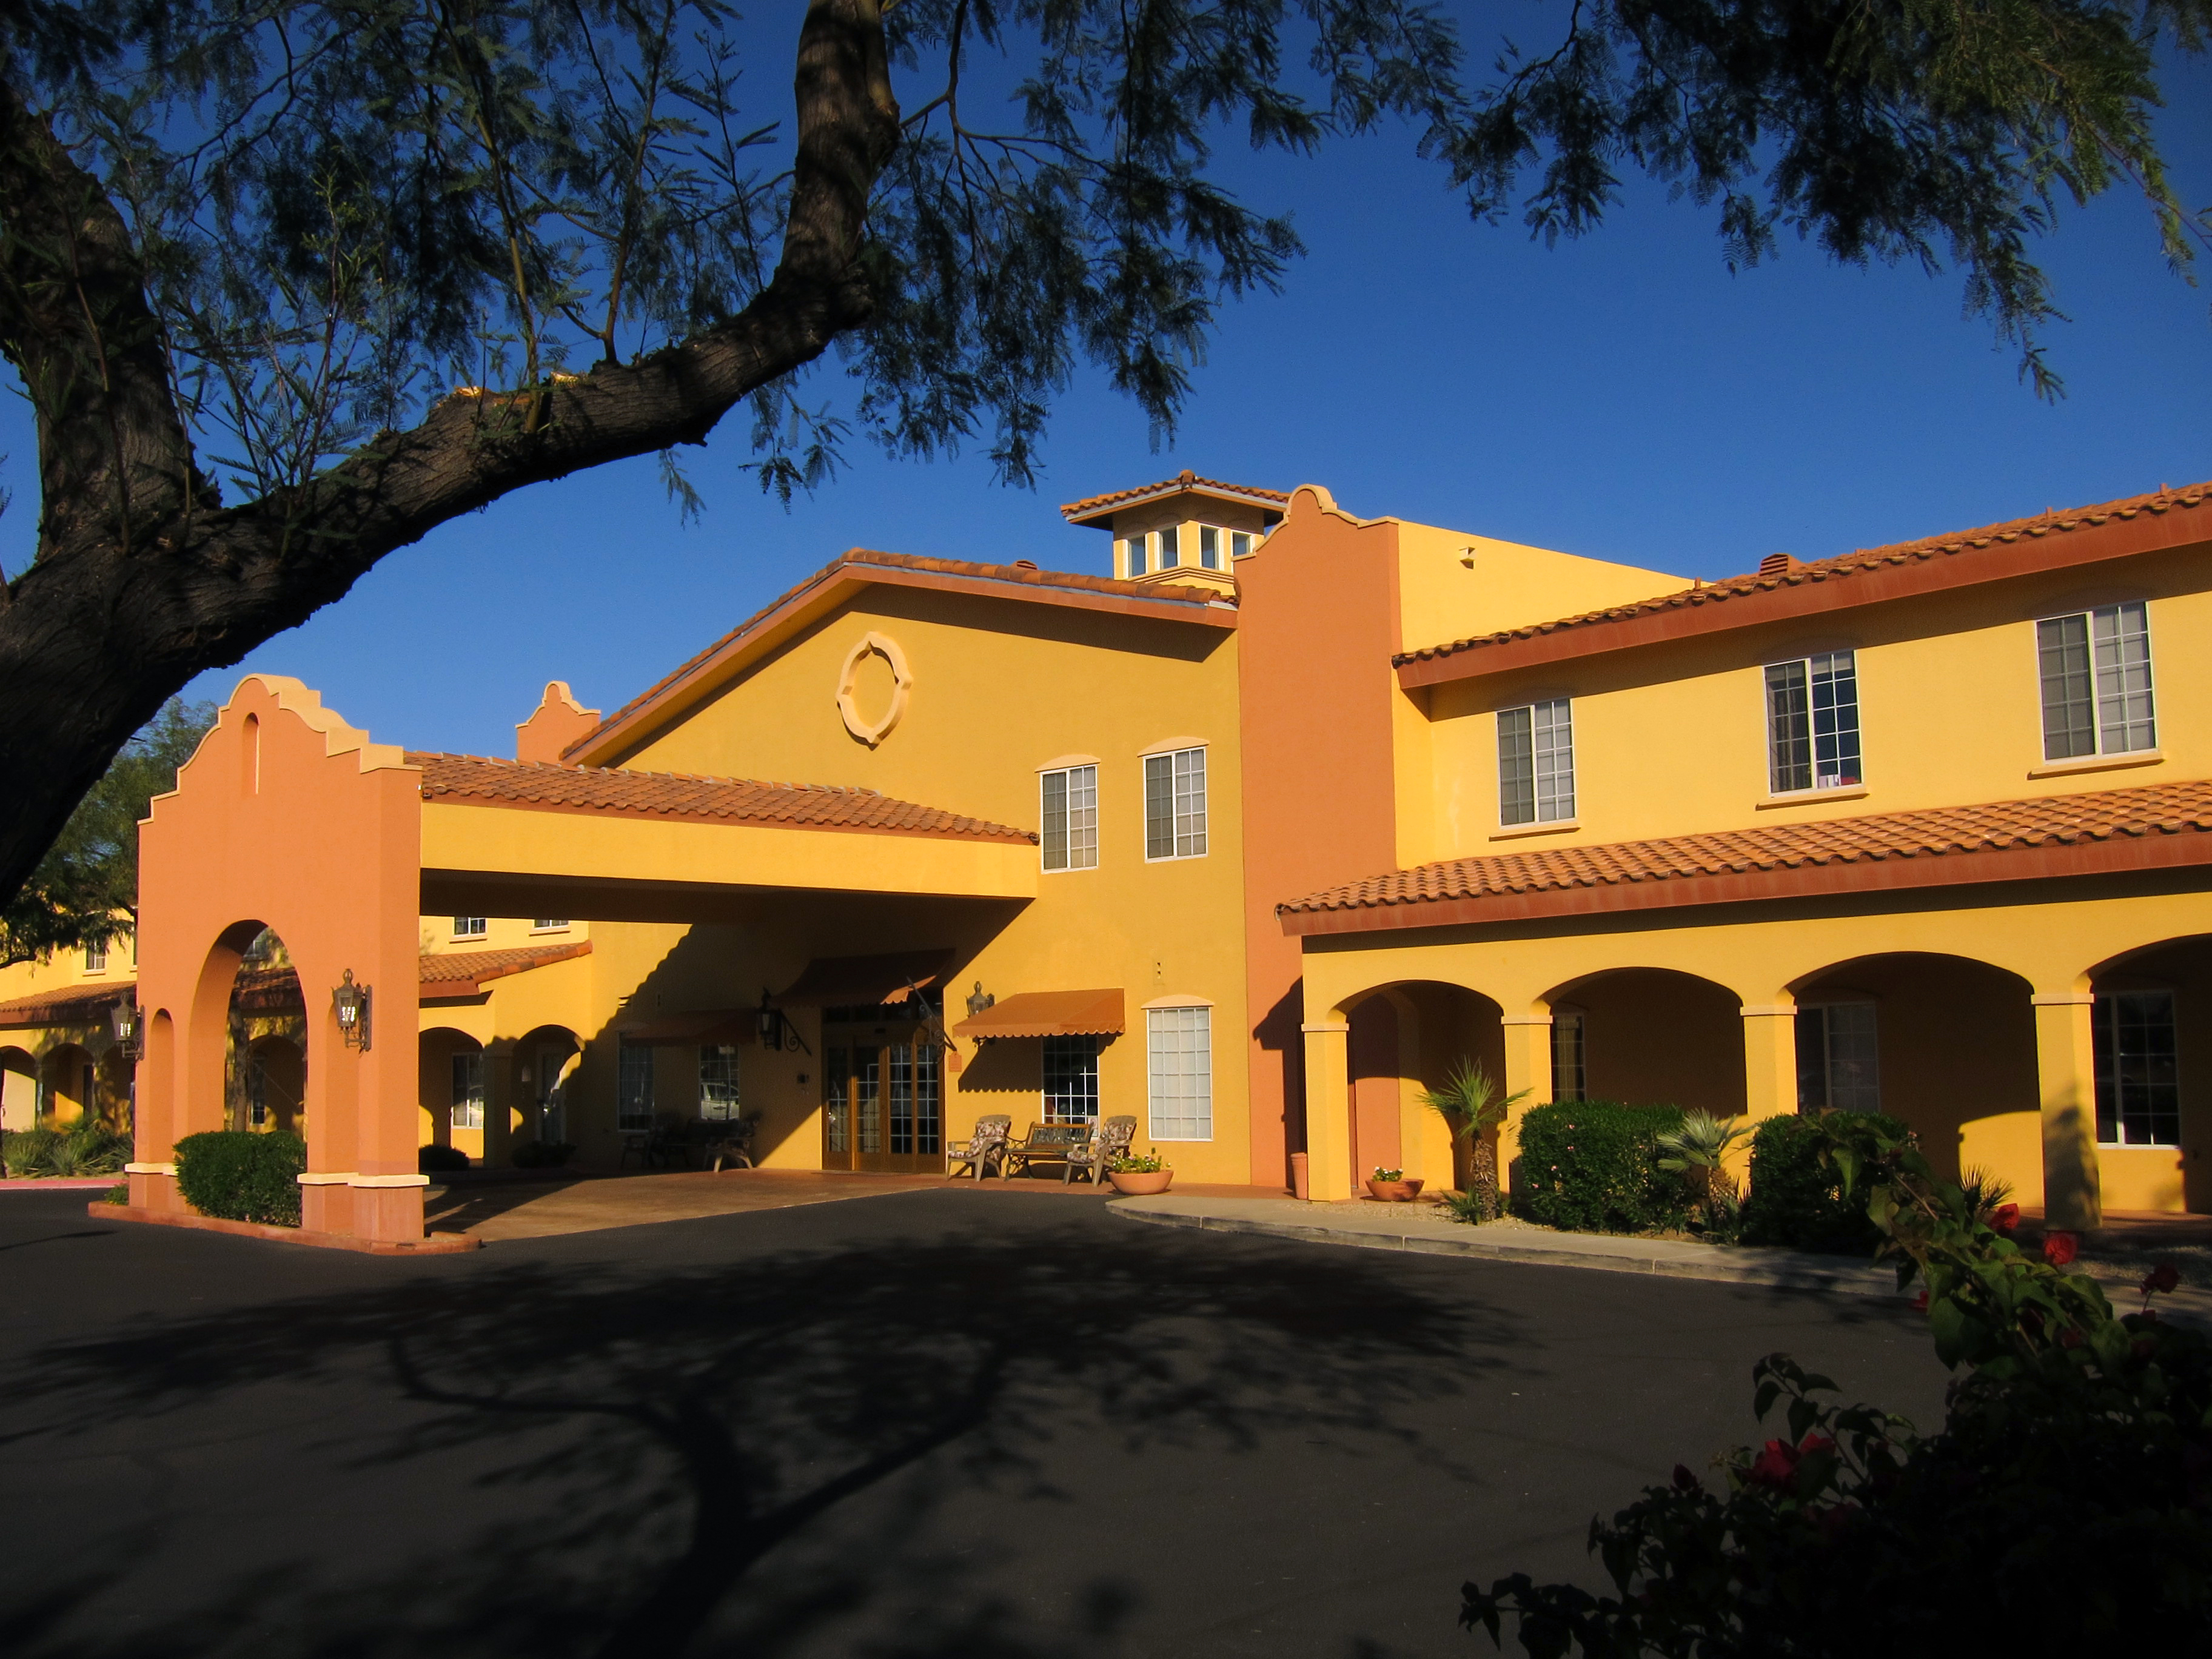 Pennington Gardens - Chandler, AZ - Exterior